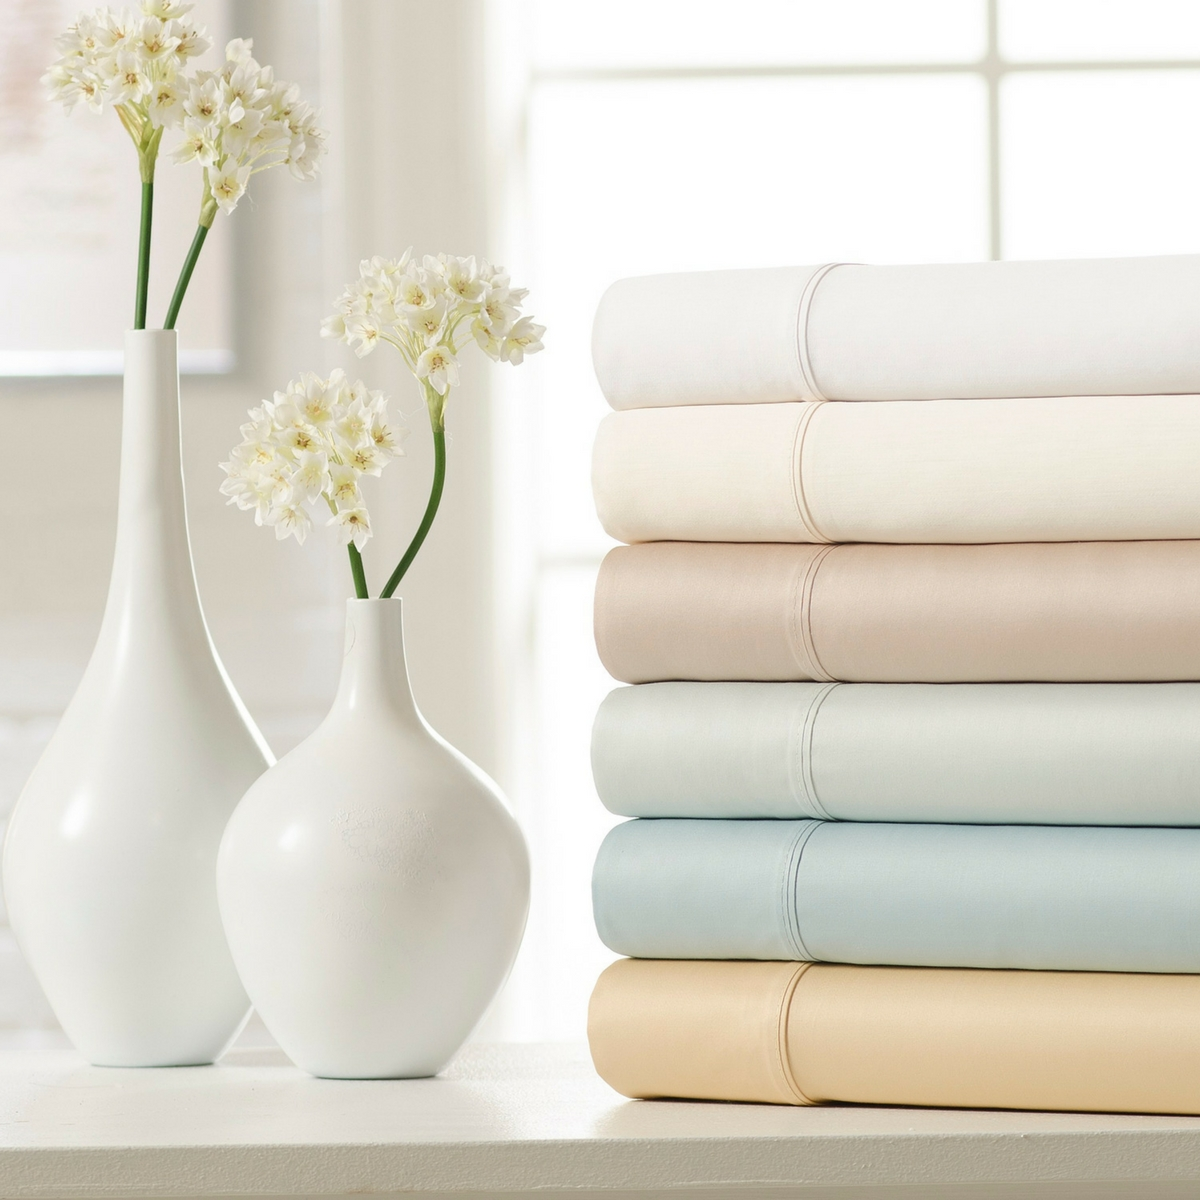 600-Thread Count 100% Cotton 6-Piece Sheet Set